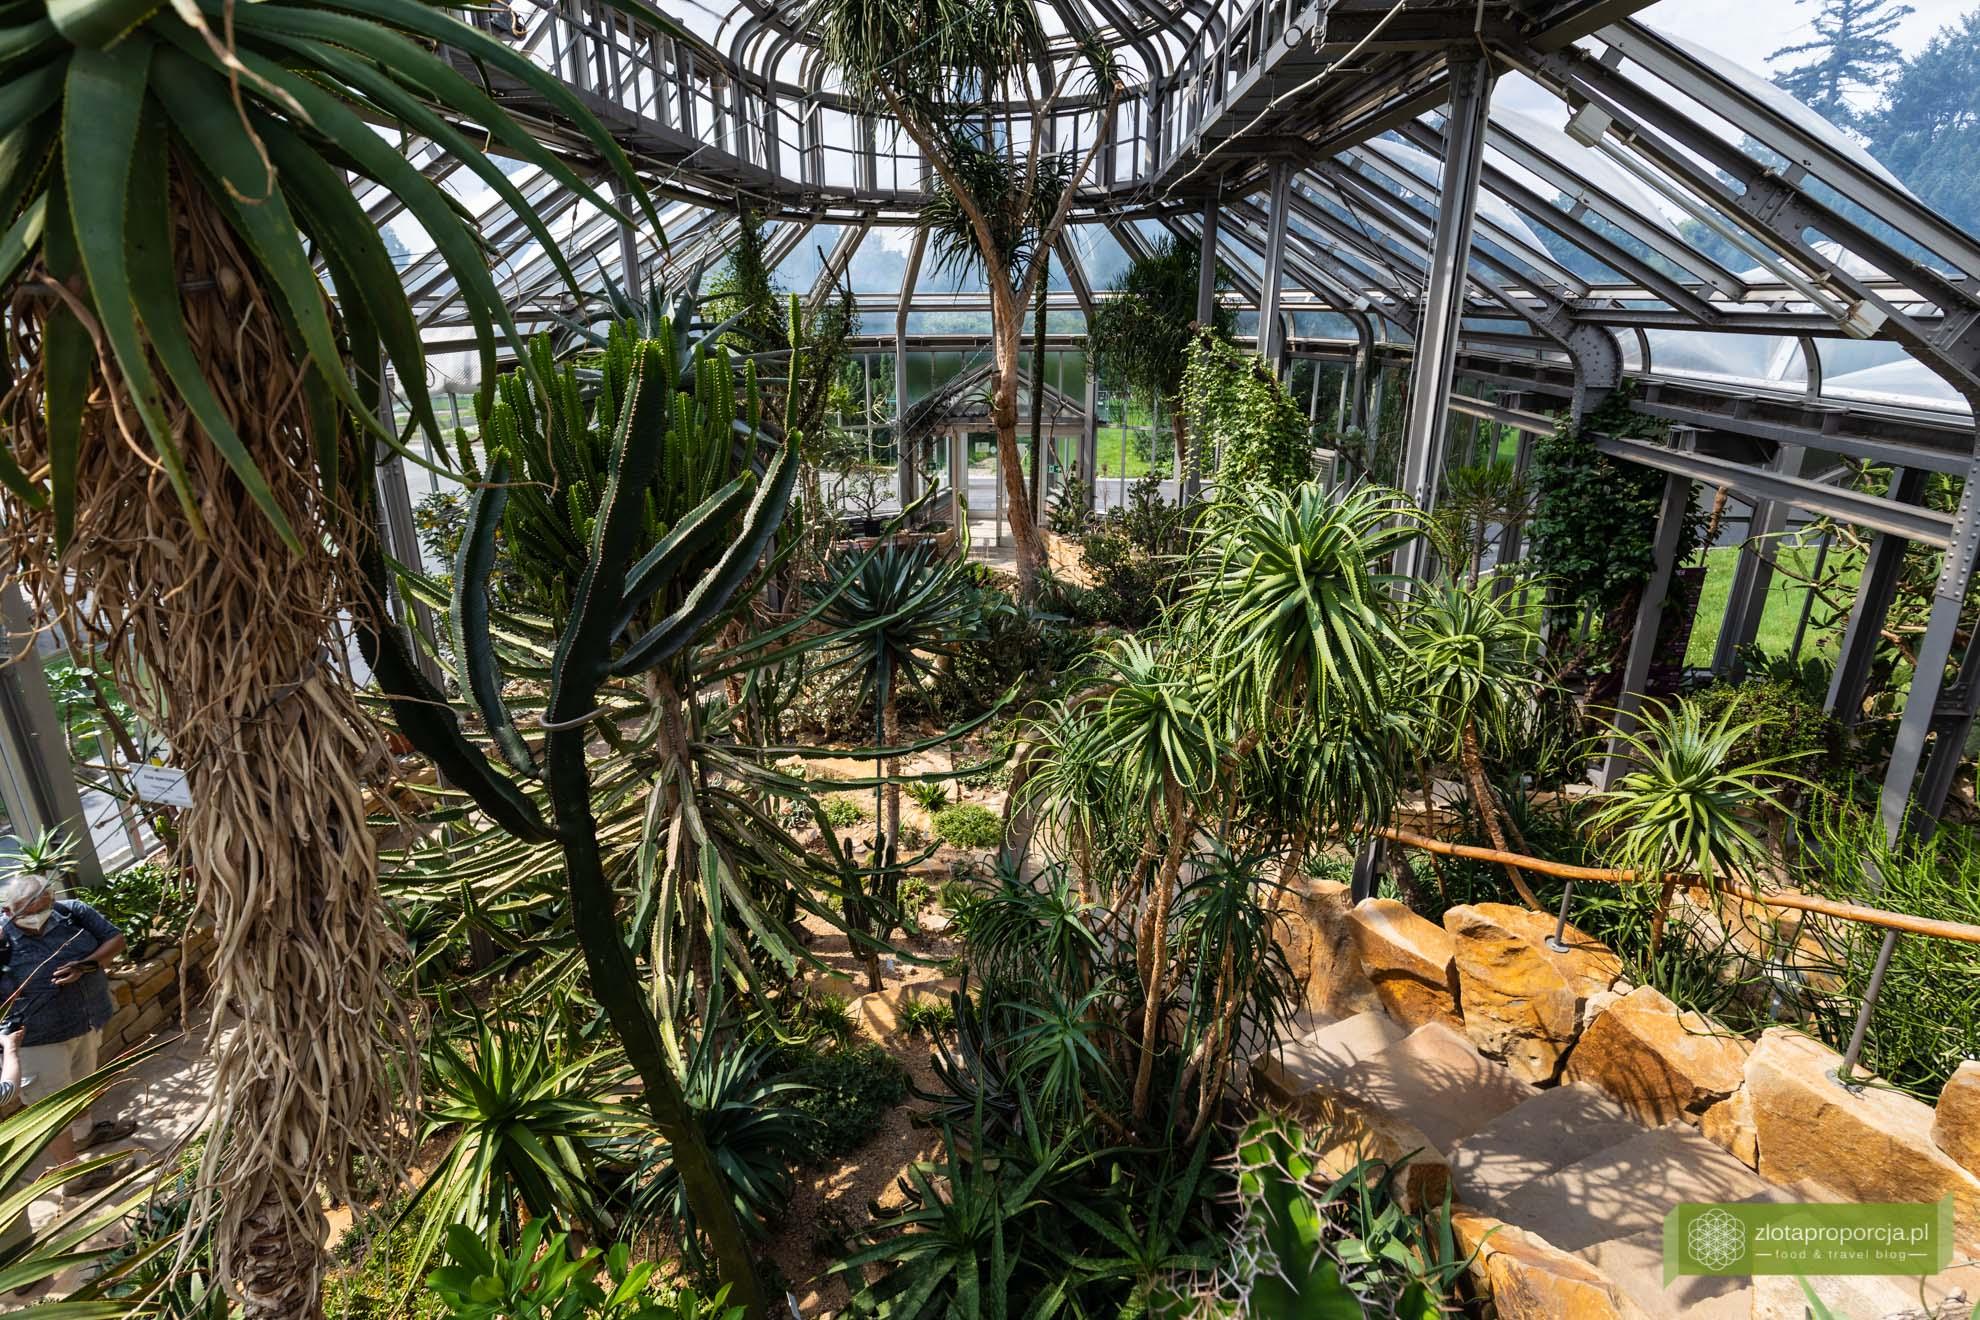 Berlin; Steglitz-Zehlendorf; atrakcje Berlina; Berliński Ogród Botaniczny; ogród botaniczny w Berlinie;